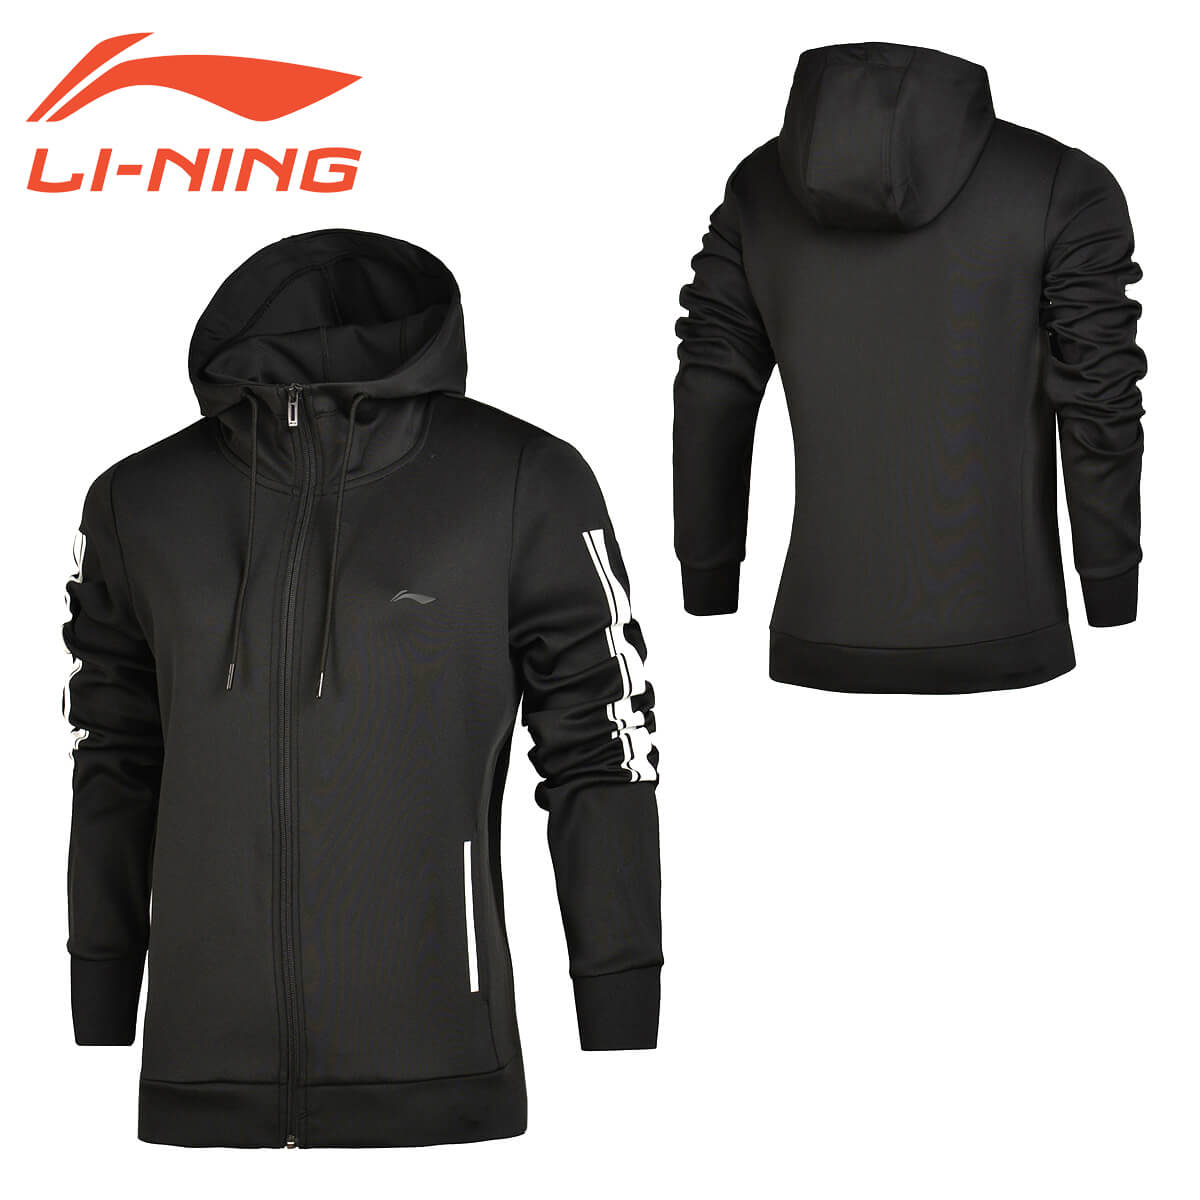 LI-NING AWDM362 反射型 ウォームアップジャケット スポーツウェア リーニン